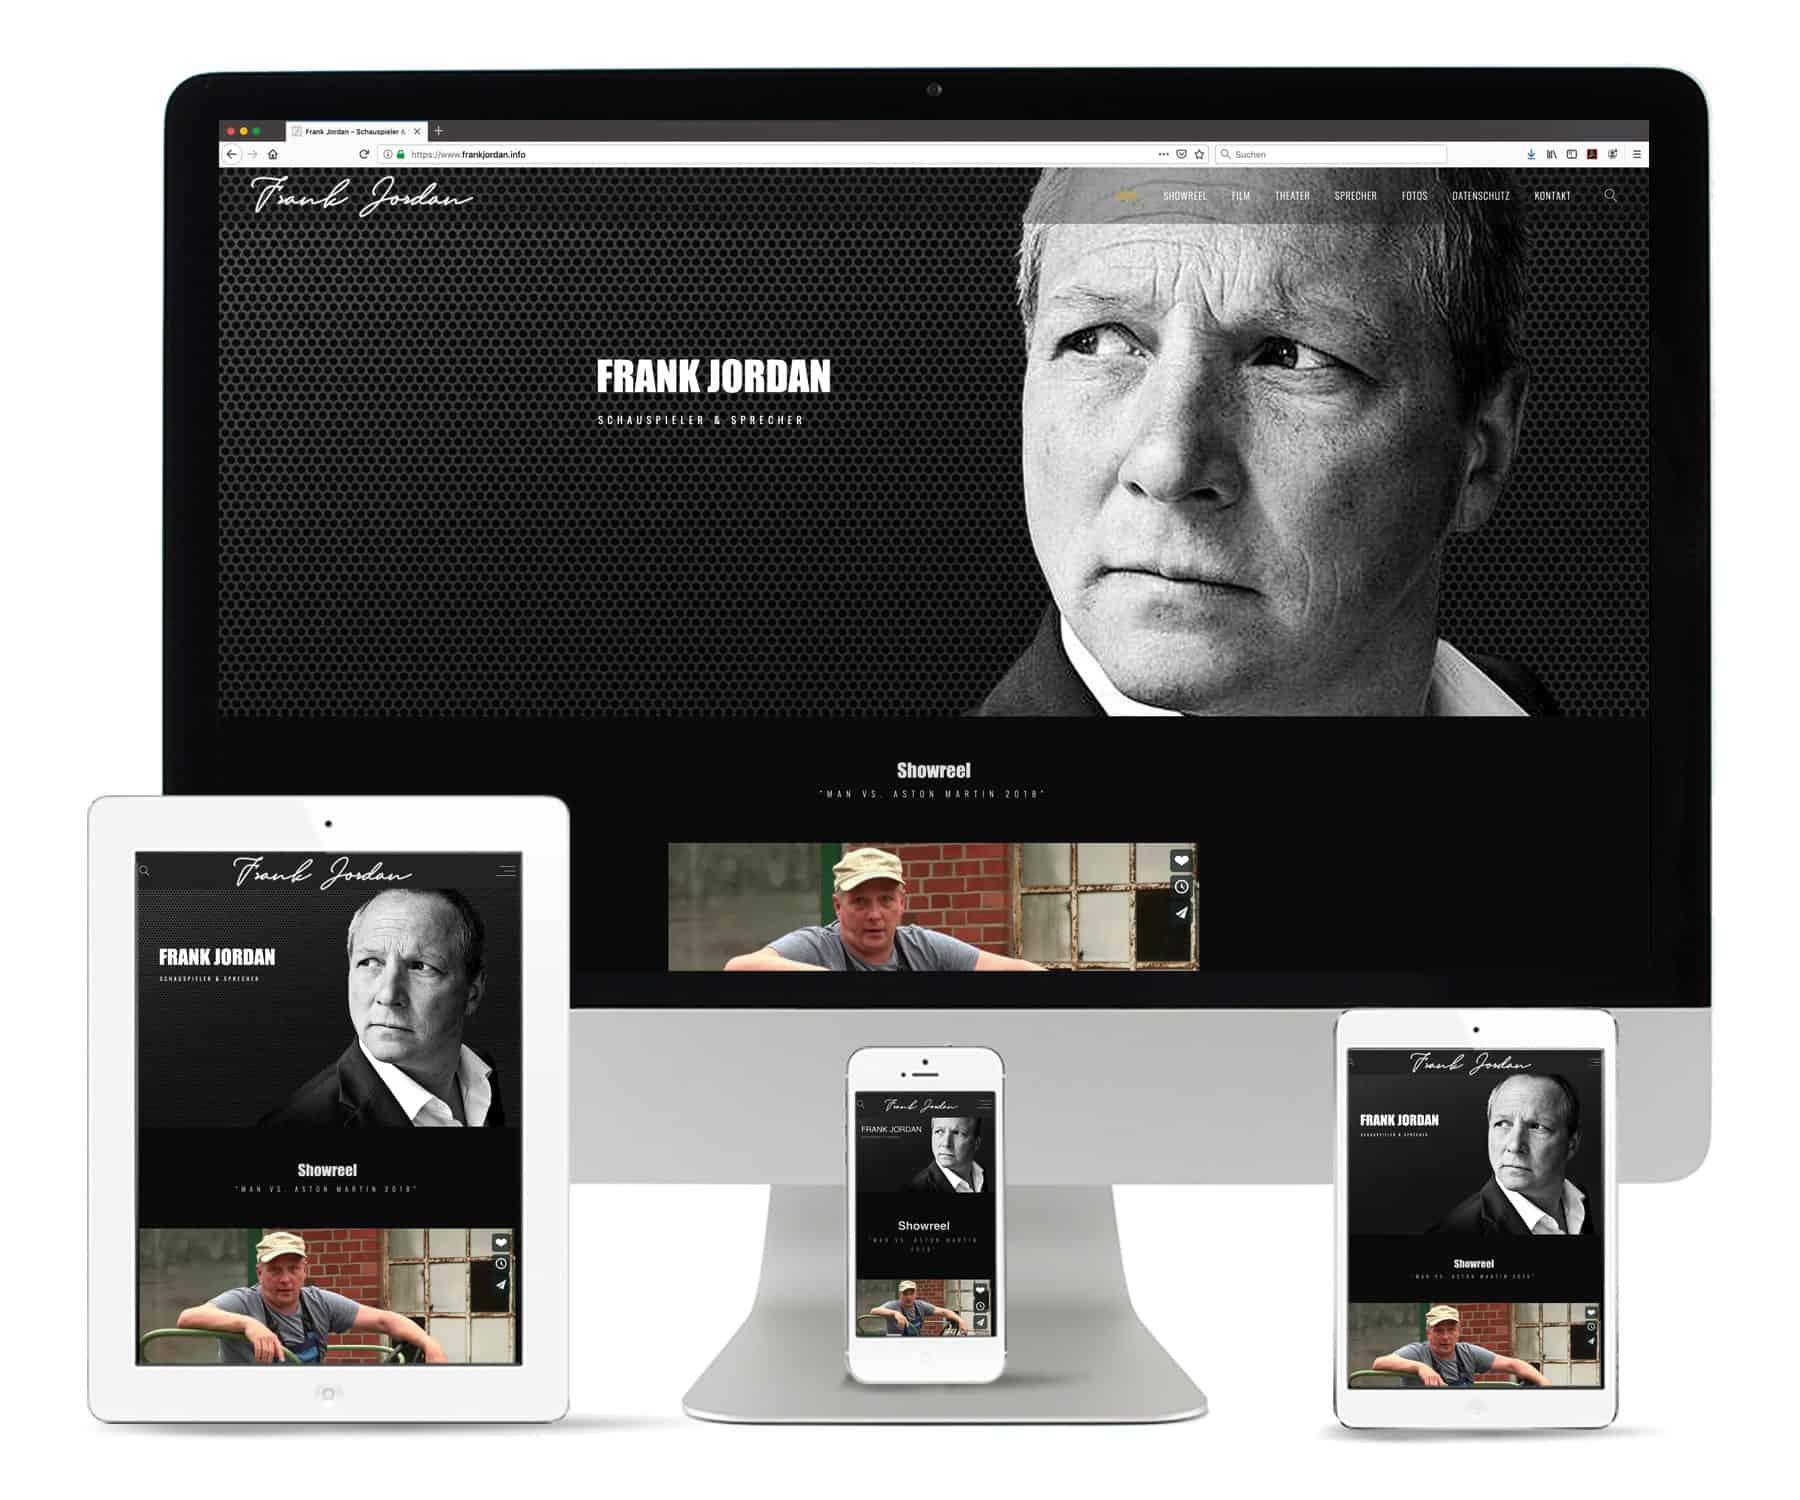 La Deutsche Vita - Internet Webseite Frank Jordan